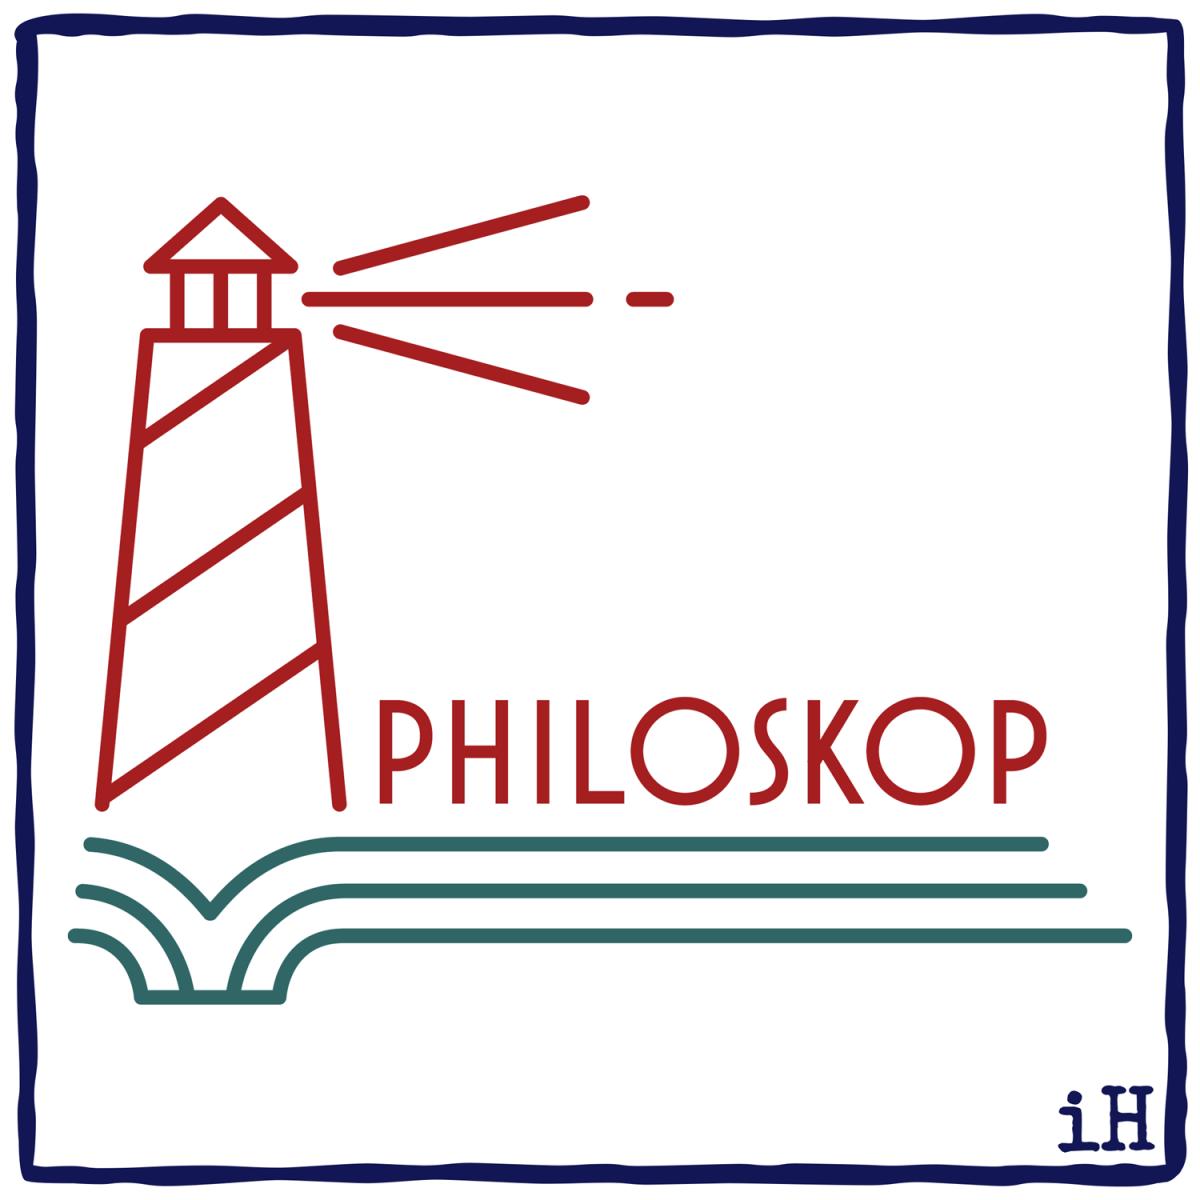 Philoskop